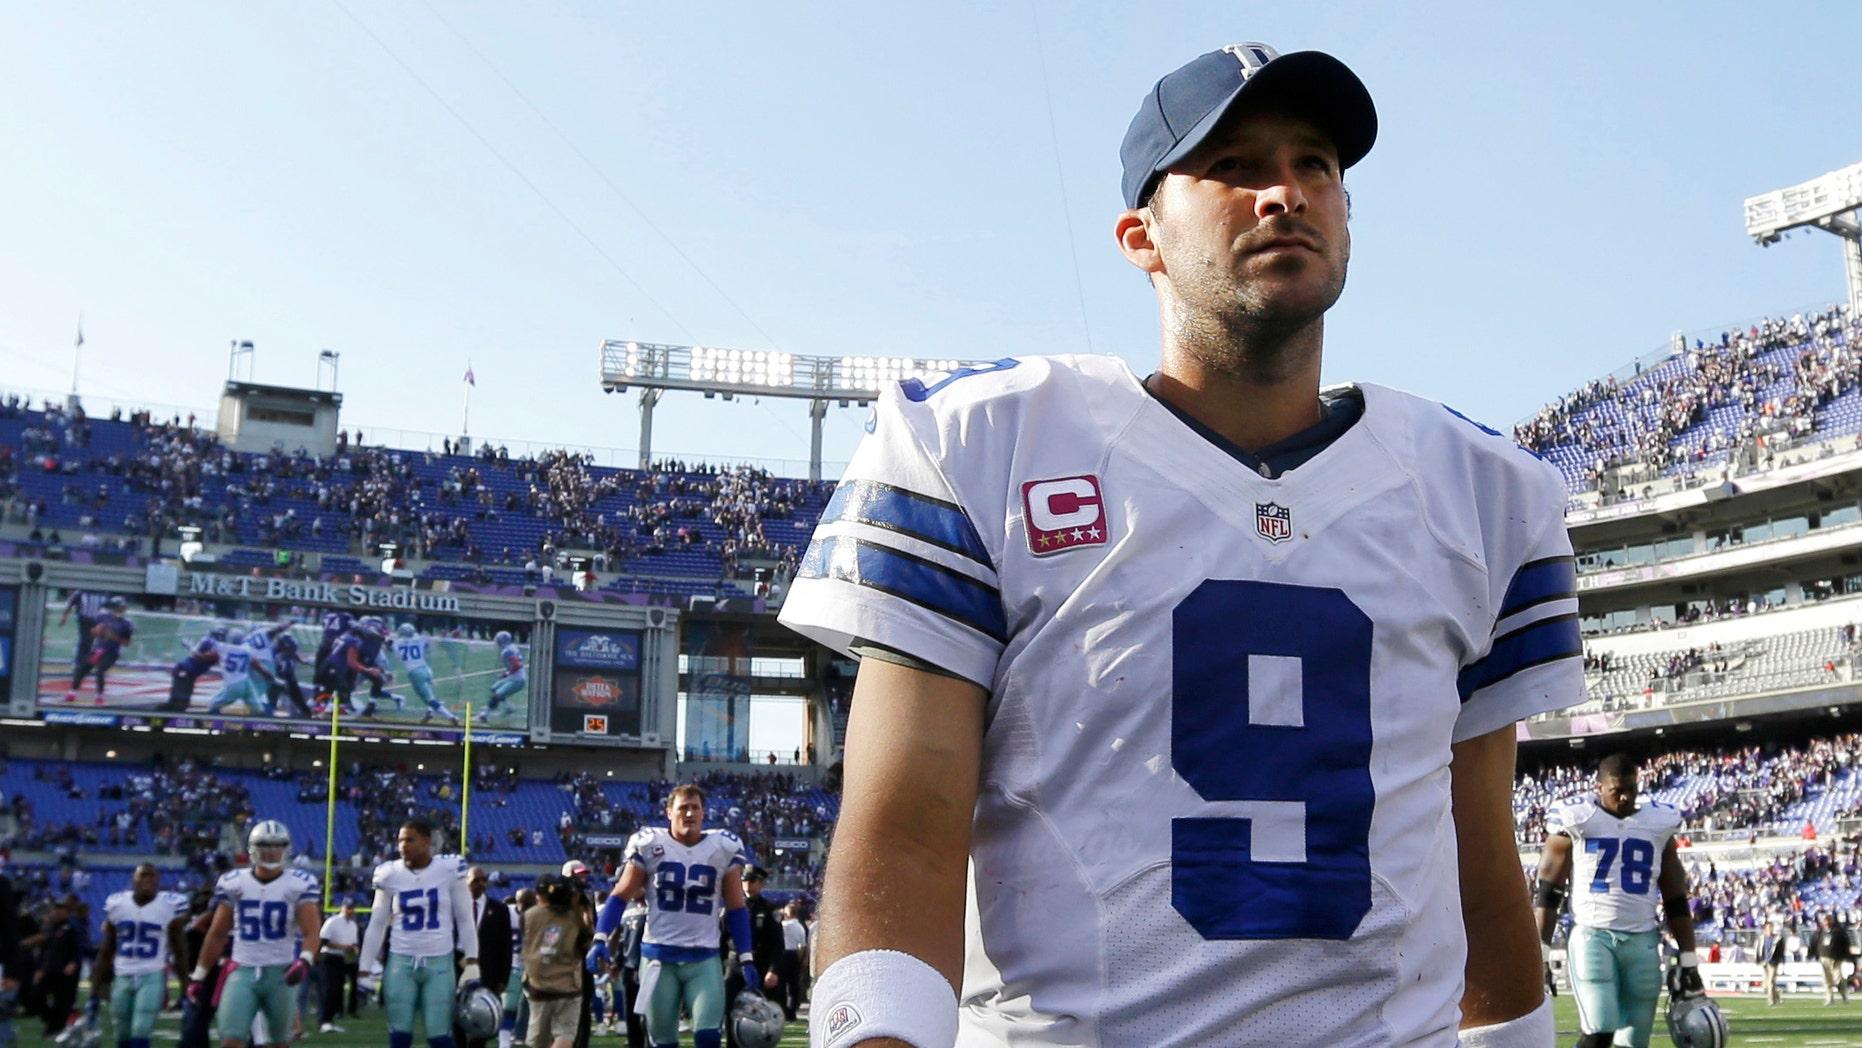 Dallas Cowboys quarterback Tony Romo (AP Photo/Patrick Semansky)